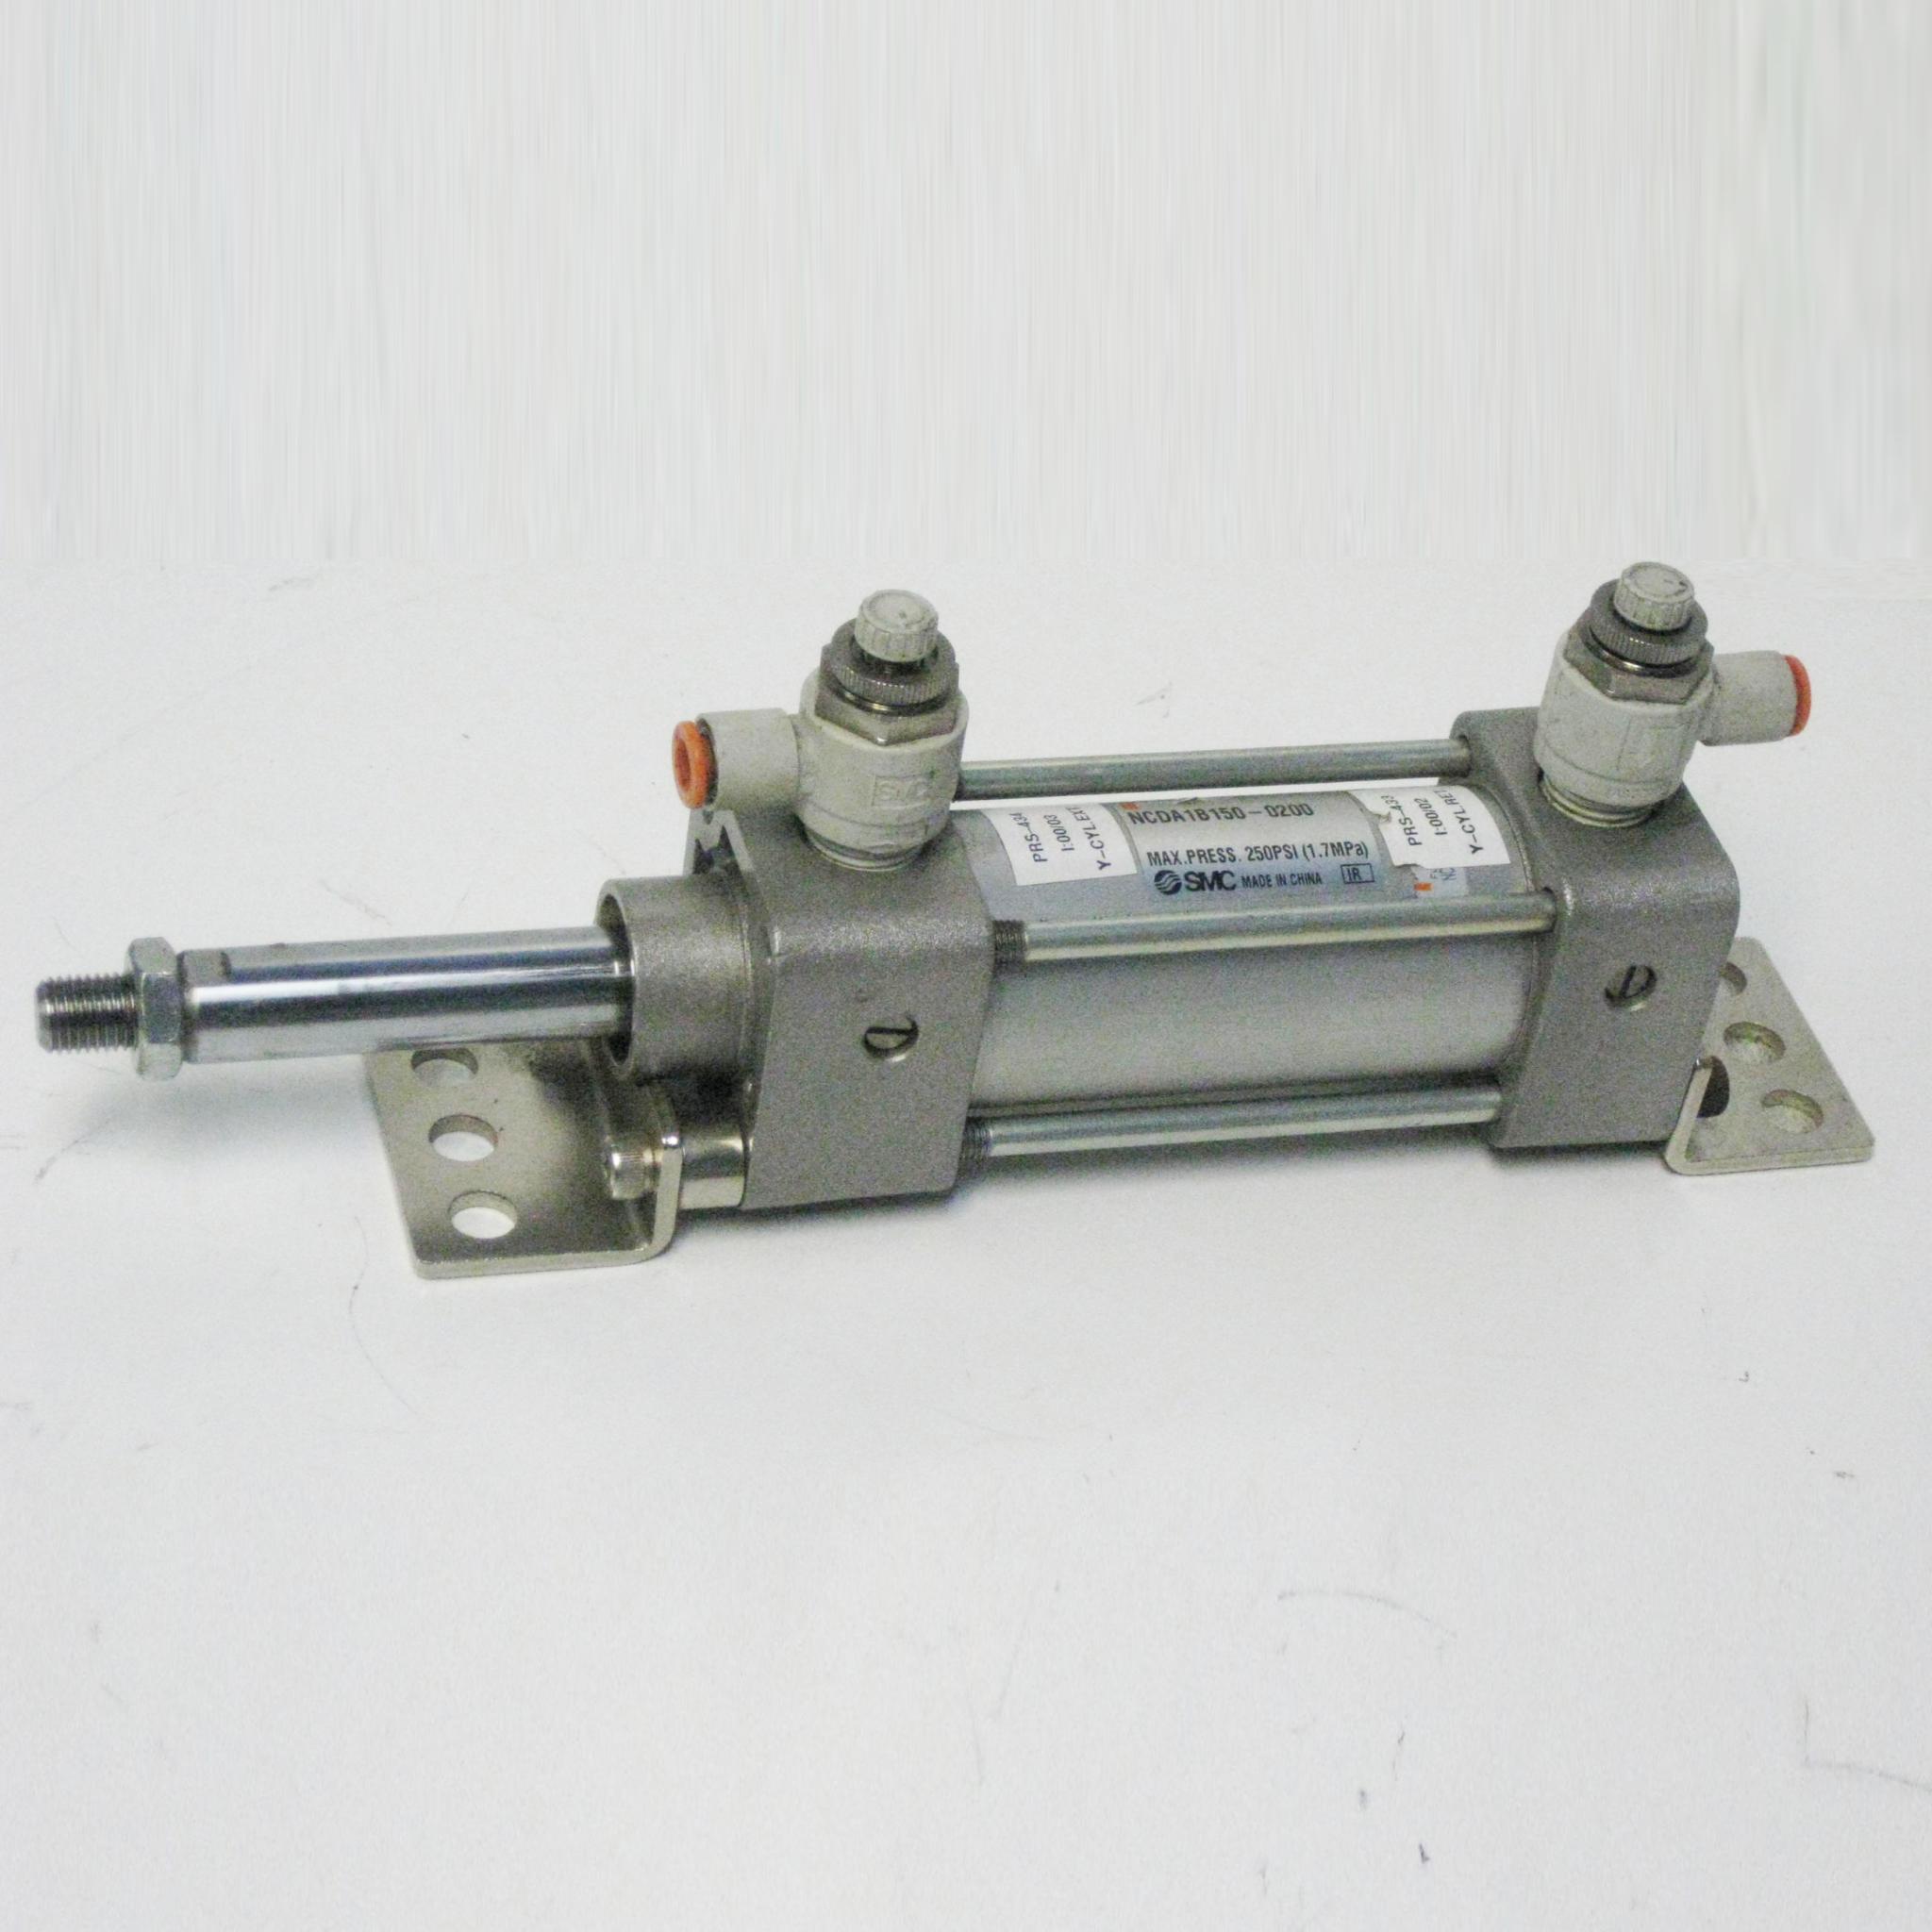 SMC NCDA150-0200